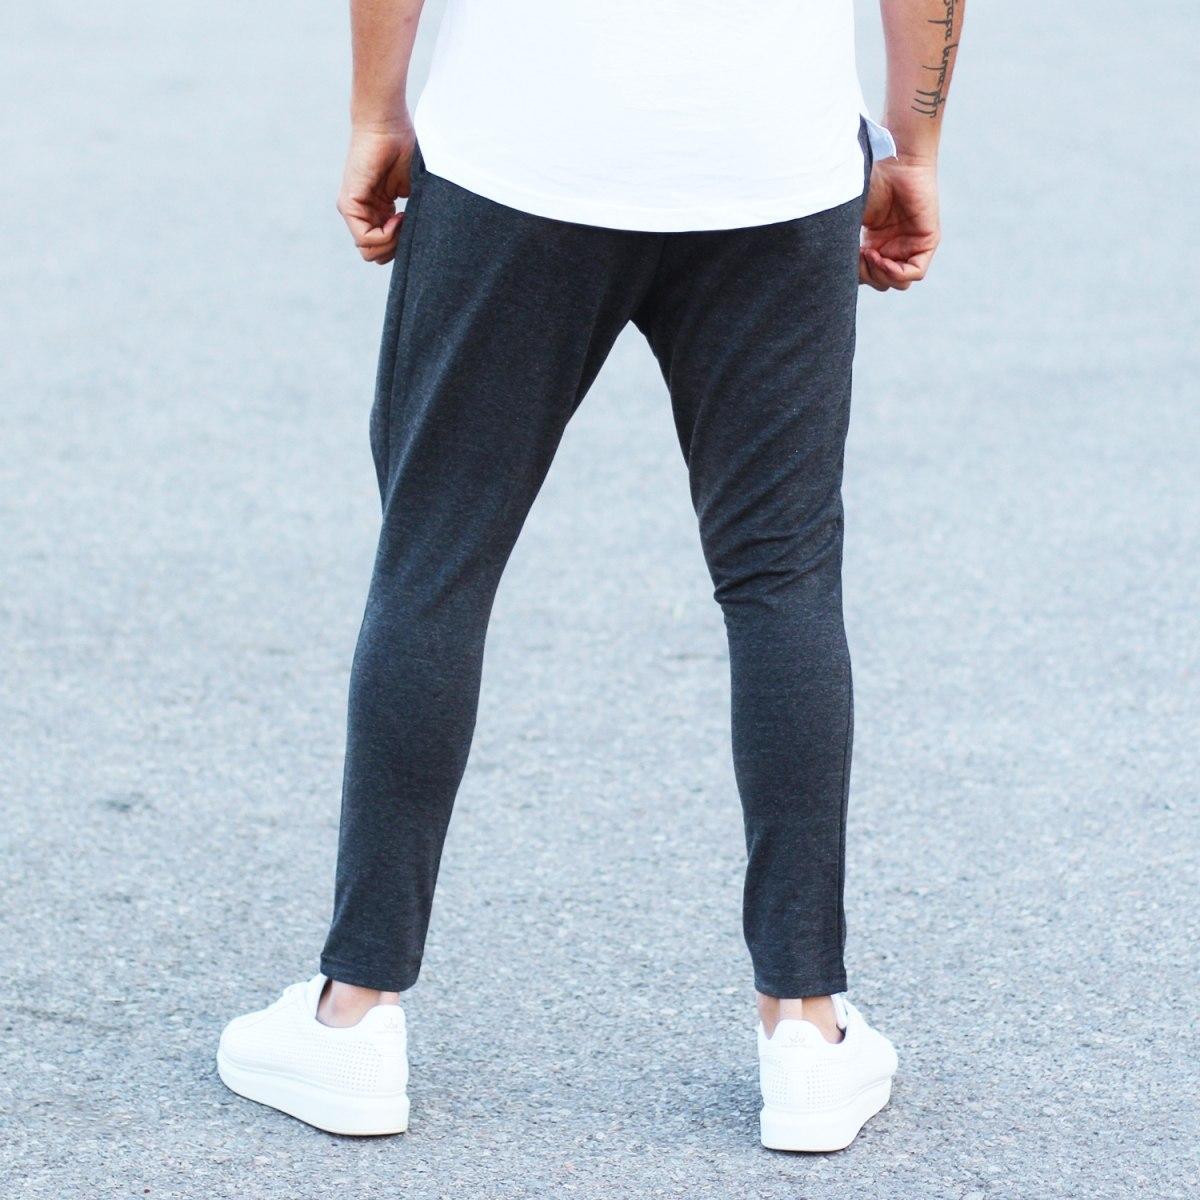 Men's Stylish Sport Pants...